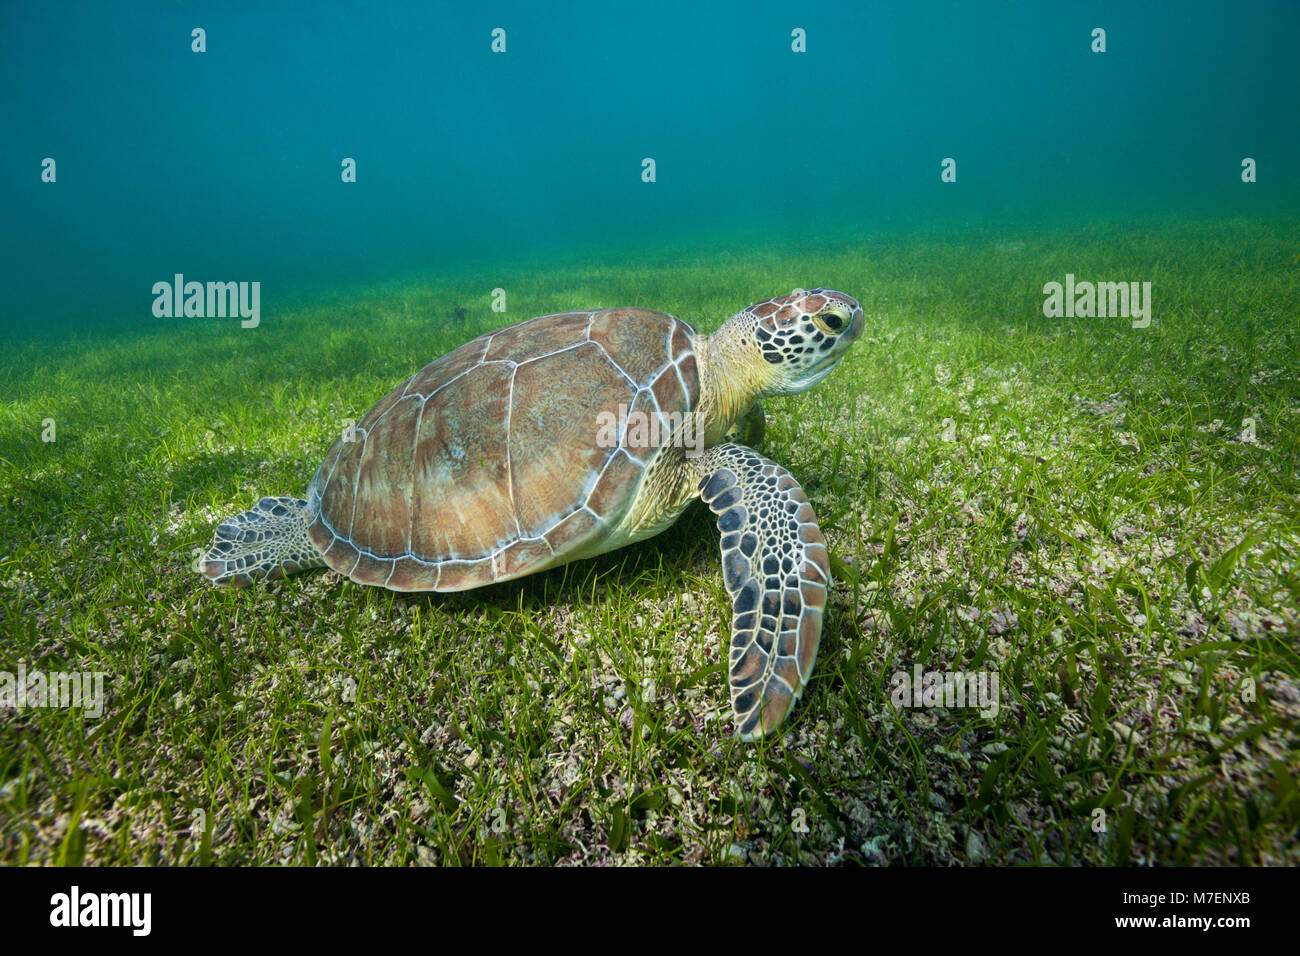 Tortugas marinas verdes, Chelonia mydas, Akumal, Tulum, México Imagen De Stock